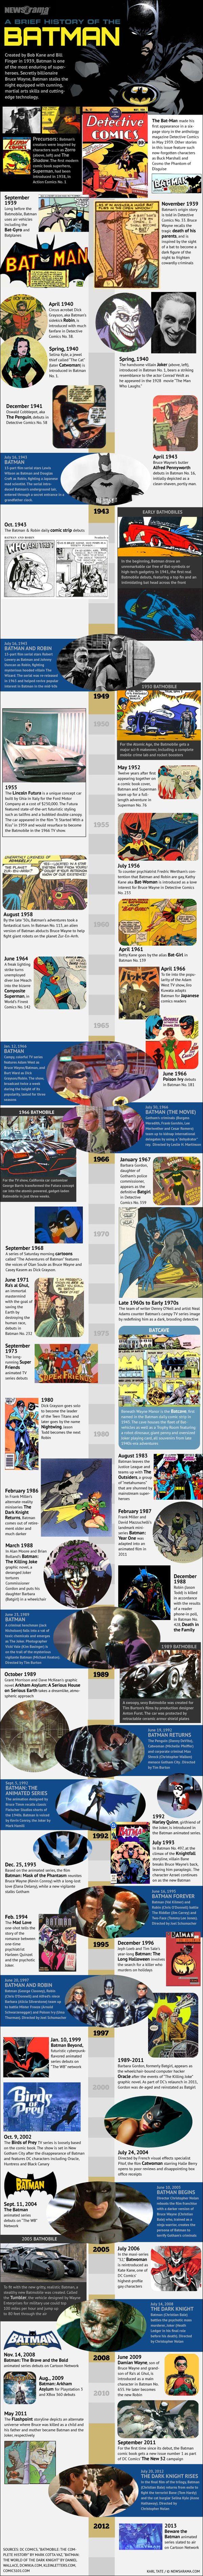 A (brief) history of The #Batman (via @pascaltea)